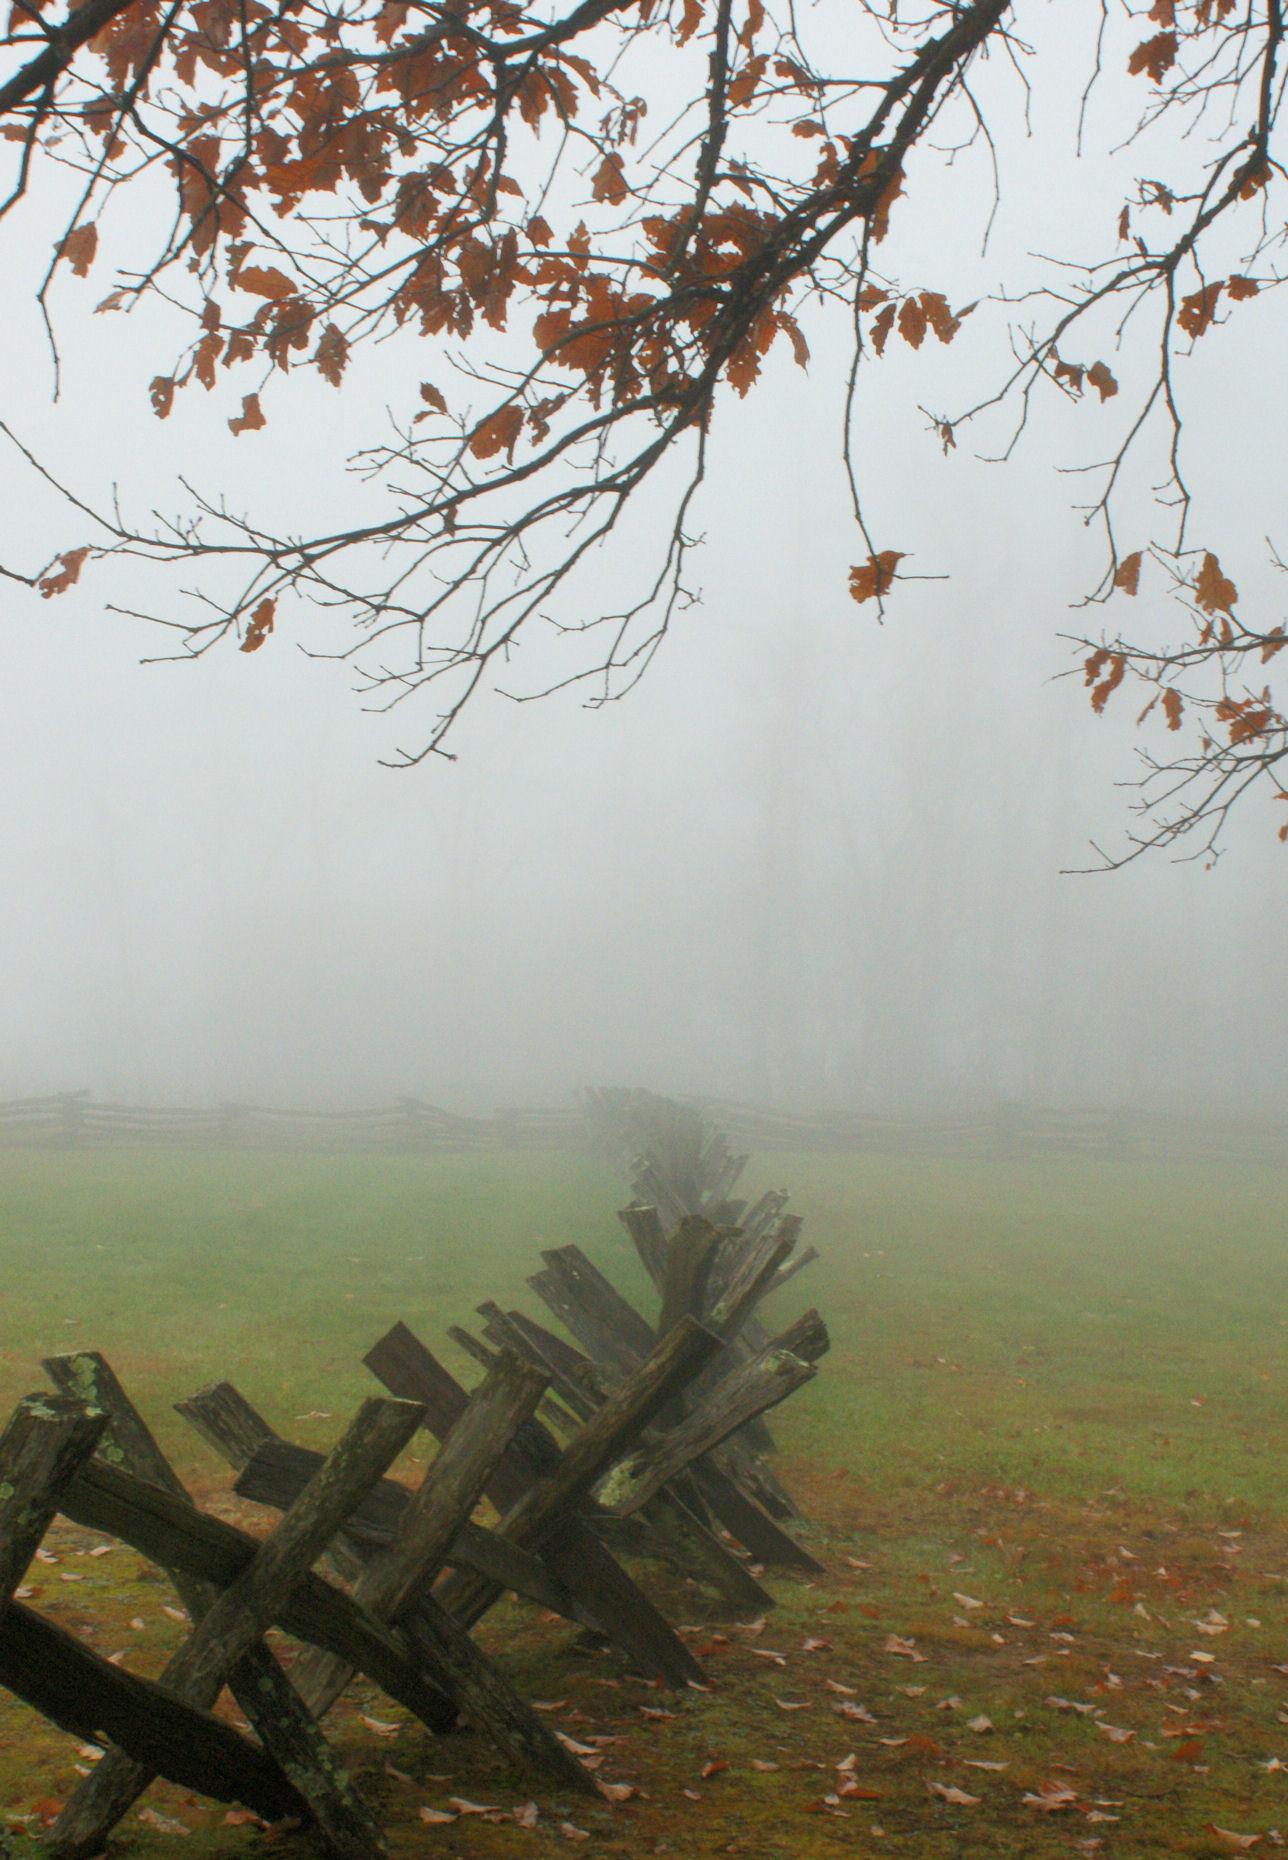 10_09 thumb fences in the fog